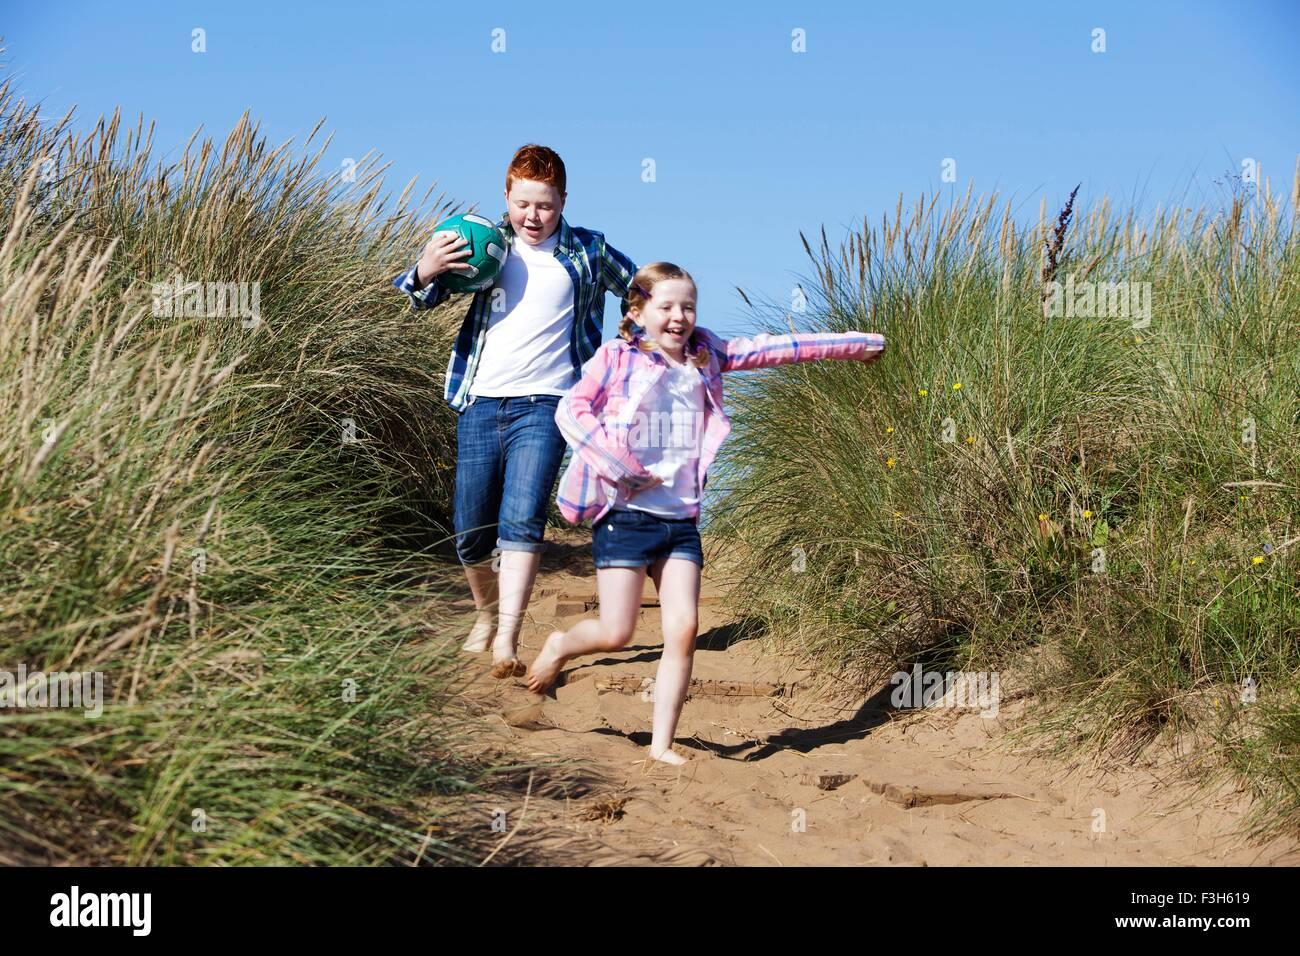 Girl and boy running through marram grass holding football smiling - Stock Image